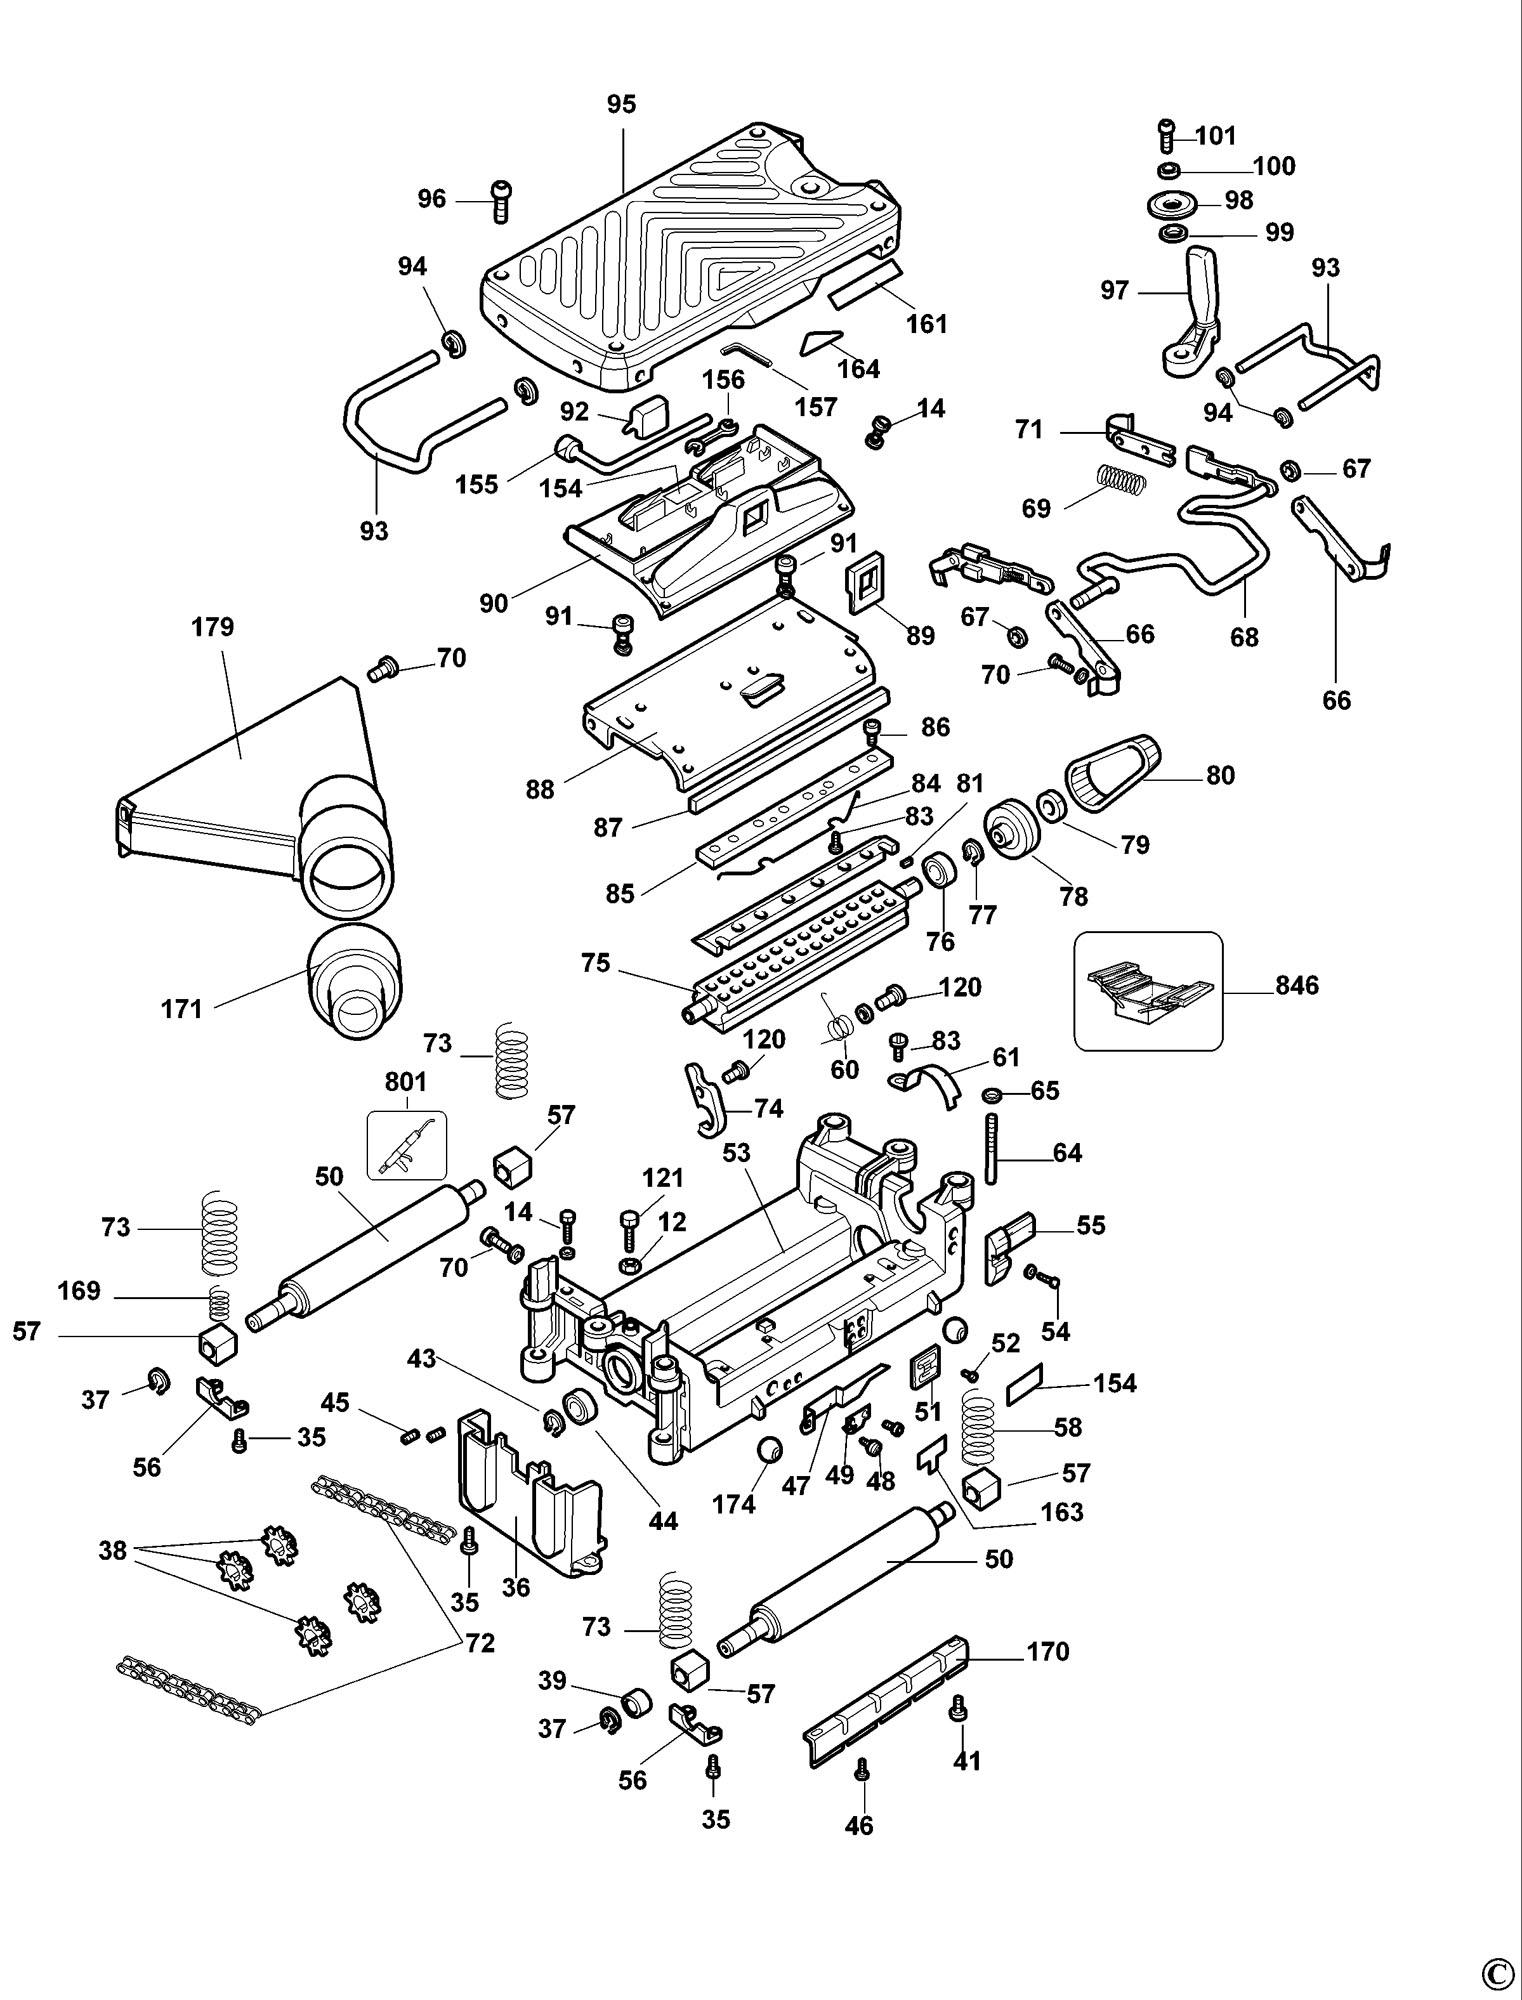 hight resolution of dewalt planer wiring diagram wiring diagram explained residential transformer diagram dewalt planer wiring diagram